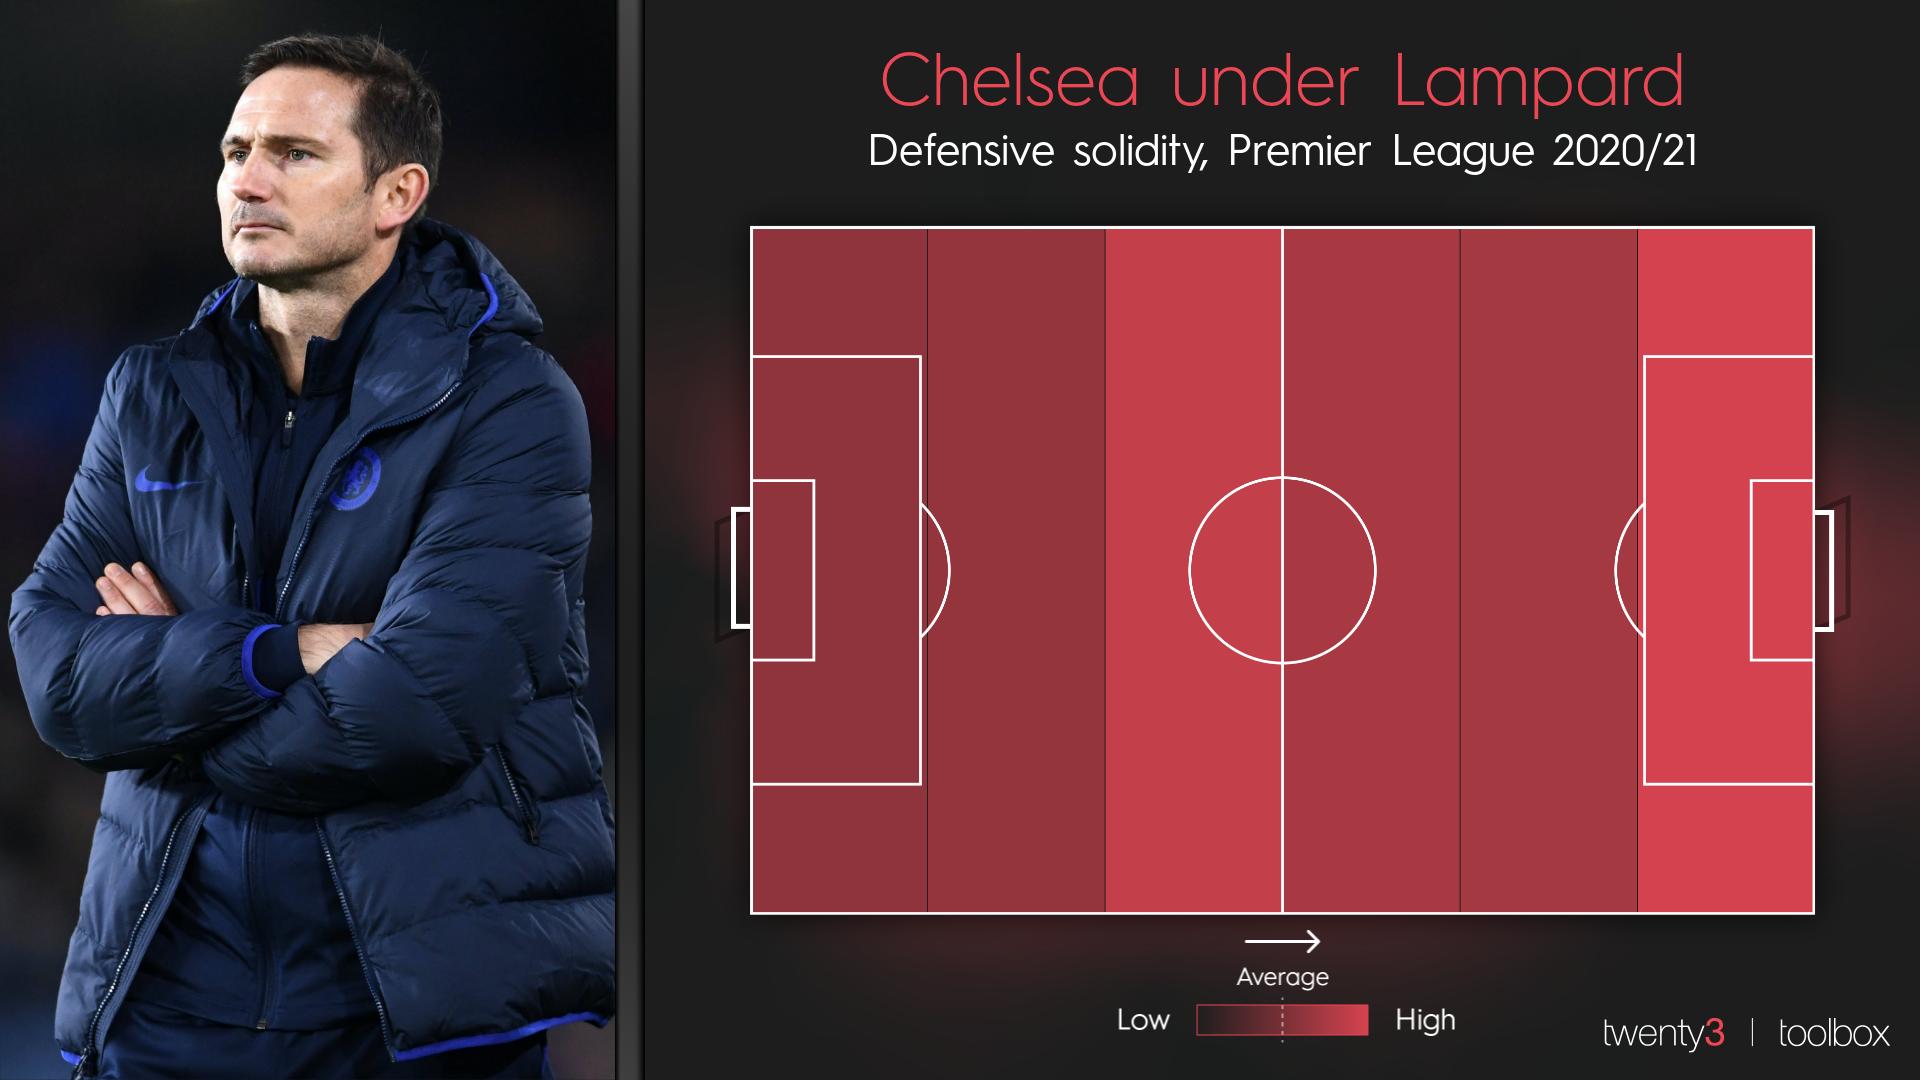 Chelsea's defensive solidity in the 2020/21 Premier League season under Frank Lampard